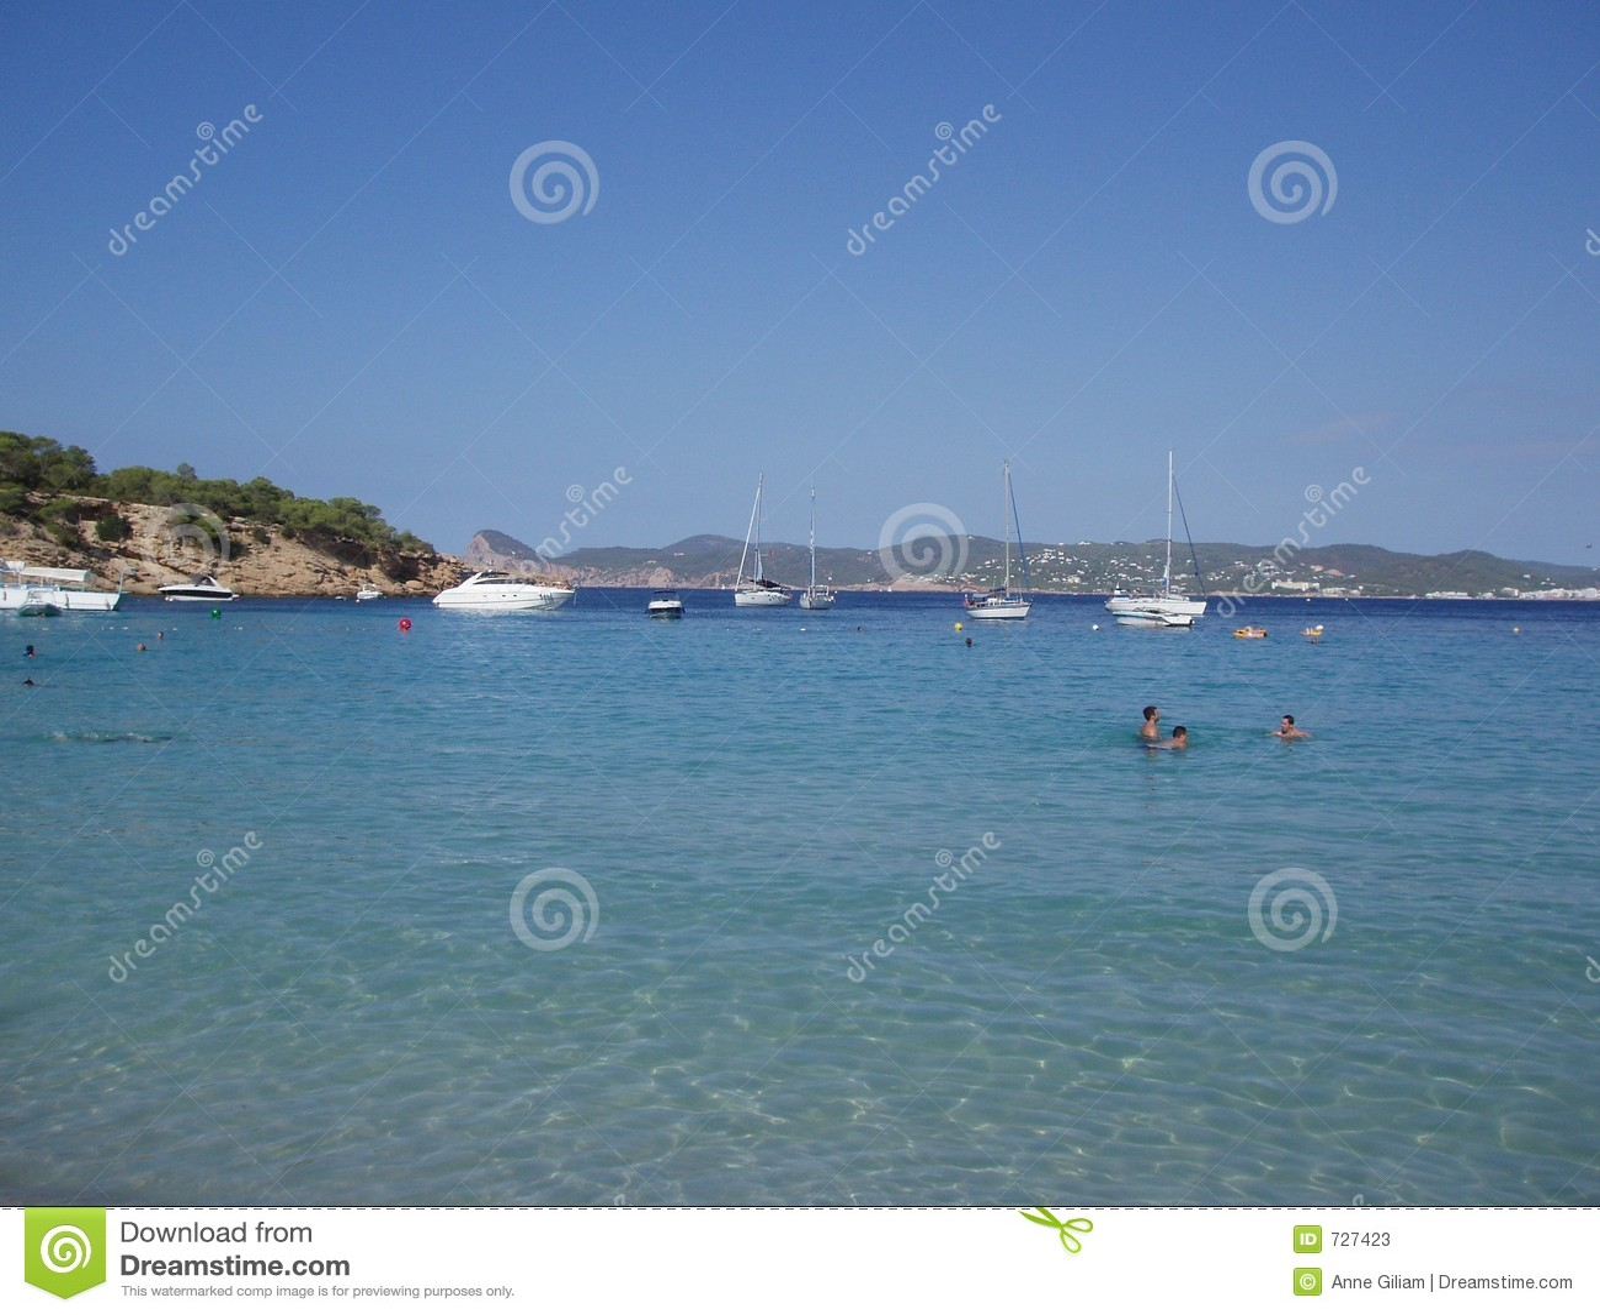 Plage de Cala Bassa, Ibiza